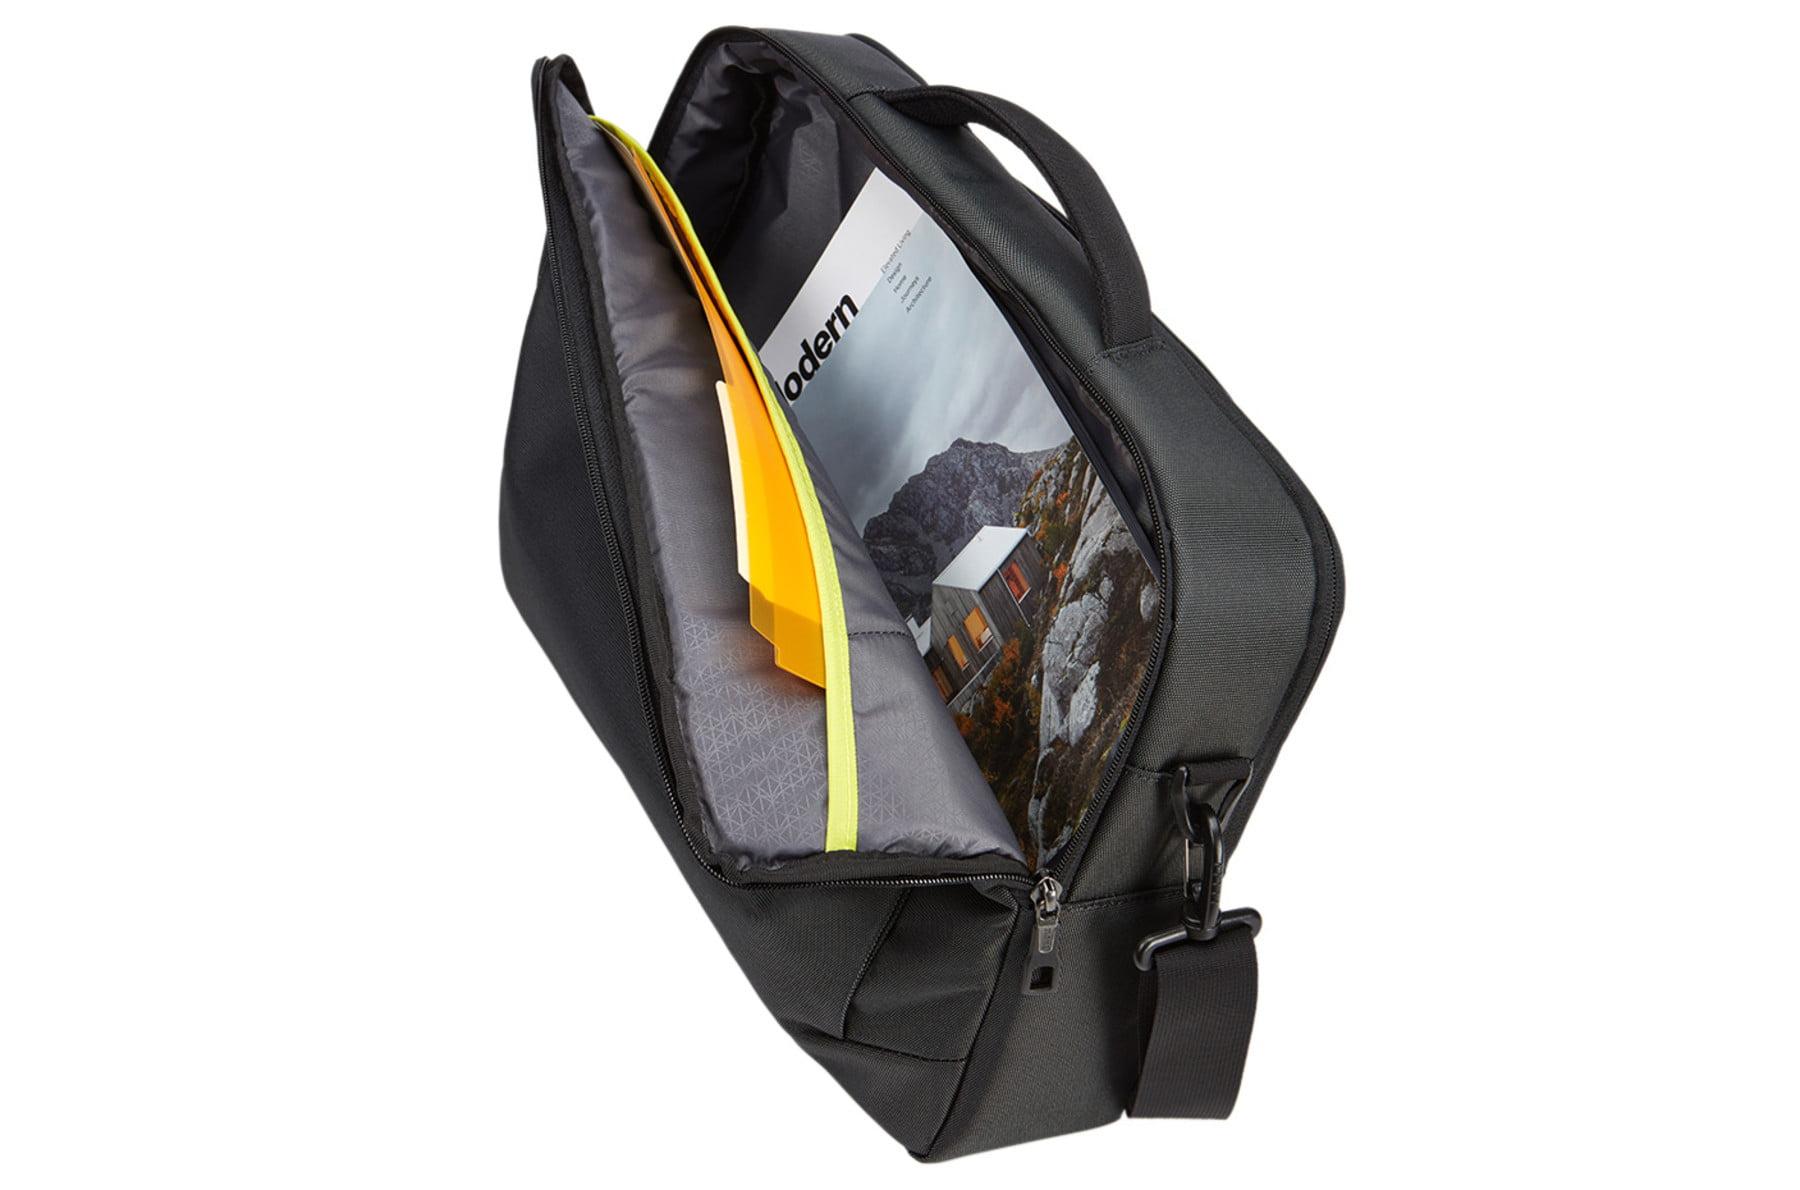 Geanta laptop Thule Subterra Laptop Bag 15.6 inchi 4